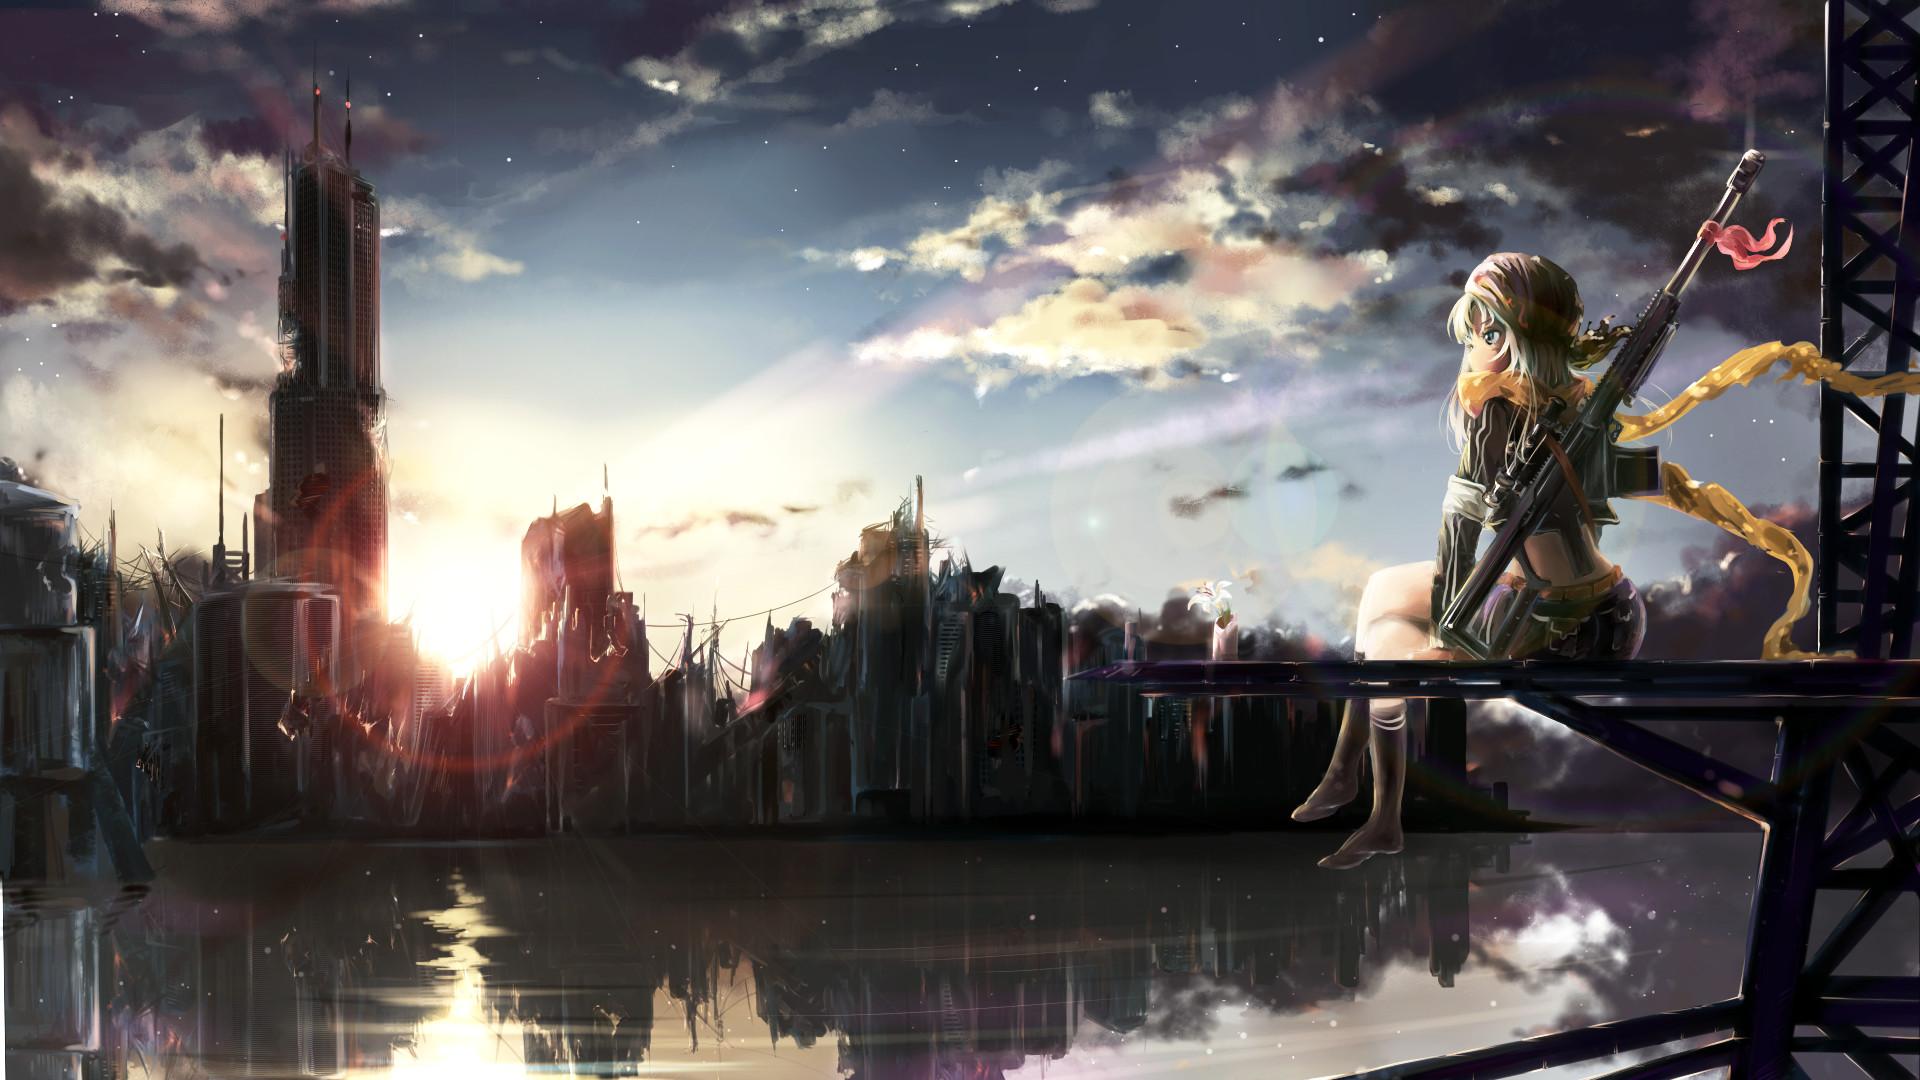 Anime – Original Girl City Ruin Post Apocalyptic Rifle Weapon Reflection  Anime Original (Anime)